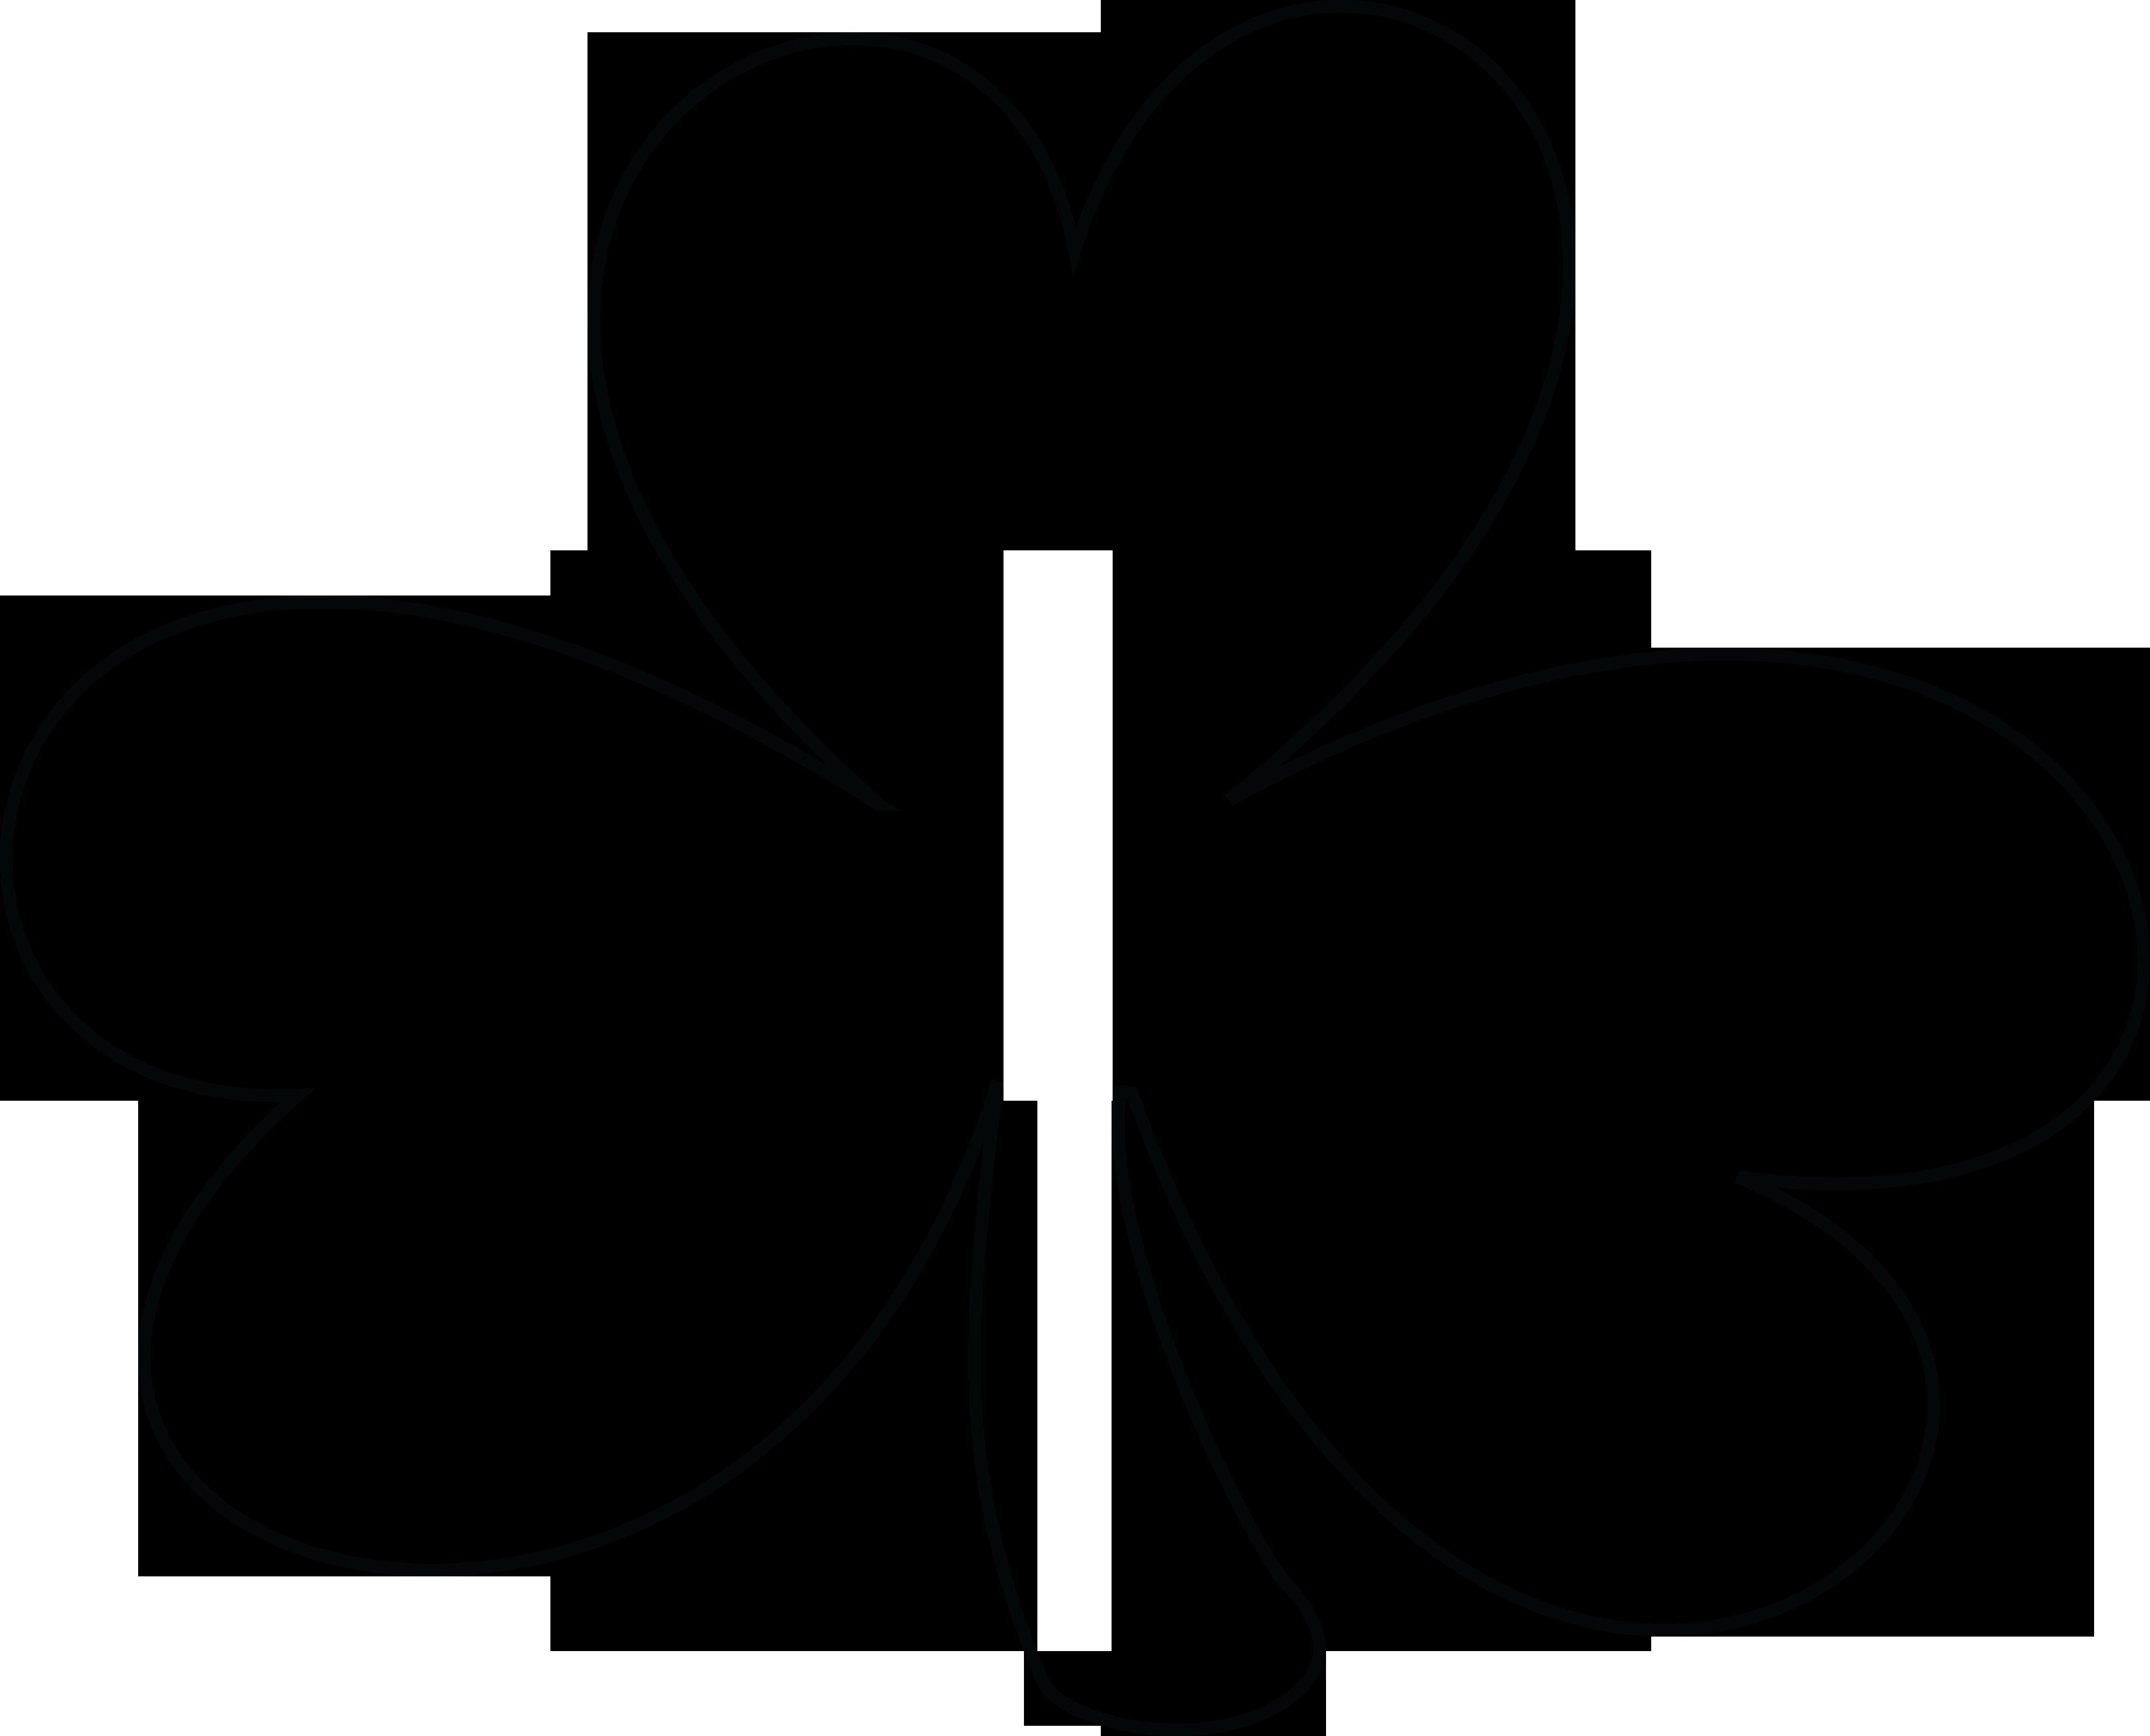 Outline clover